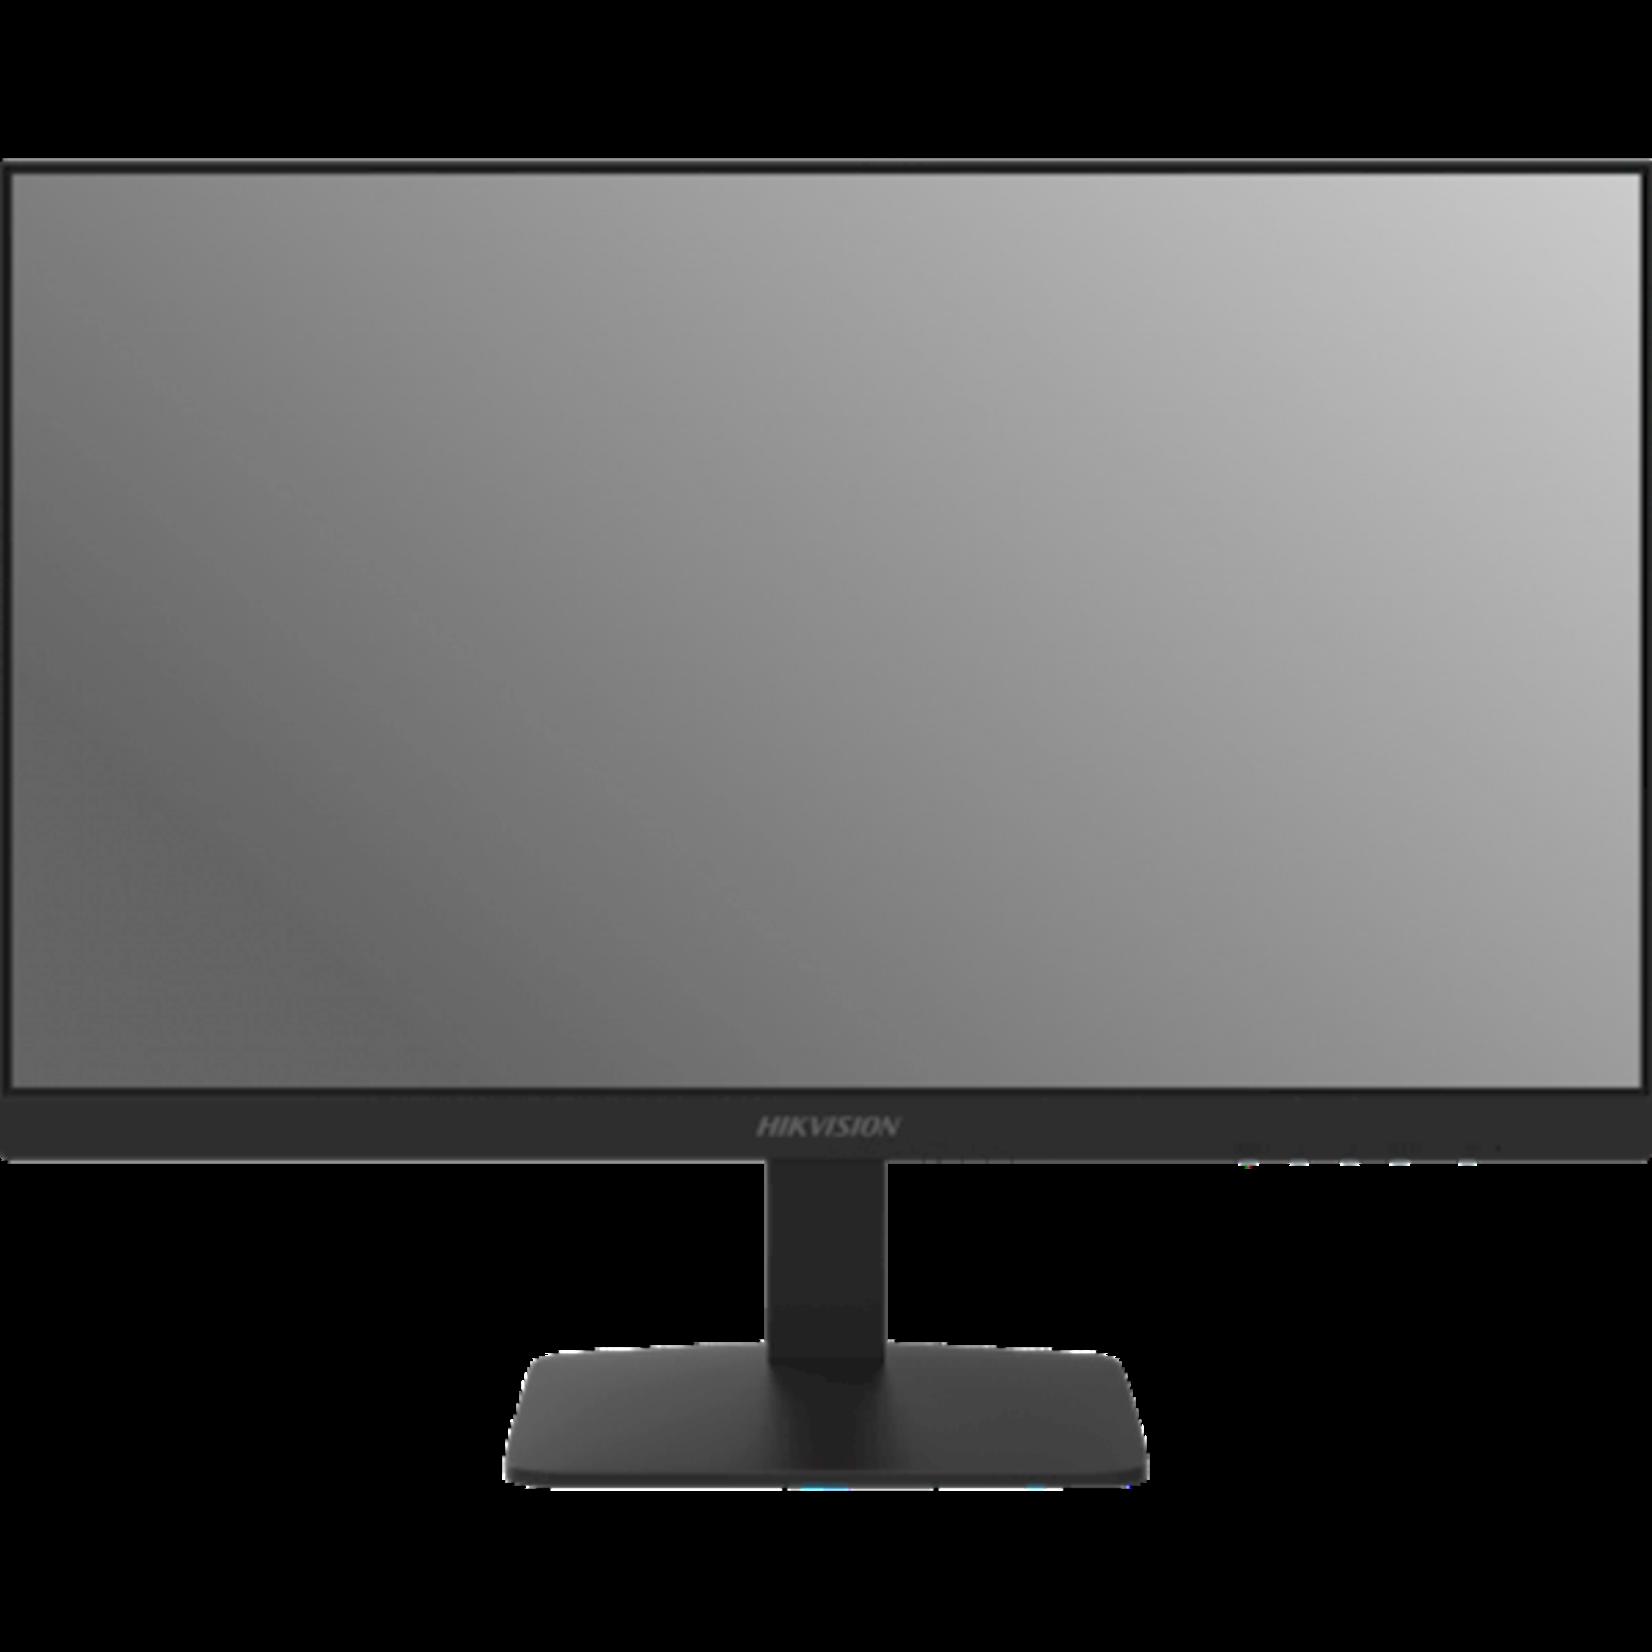 Hikvision DS-D5024FN, 23.8 inch TFT-LED monitor